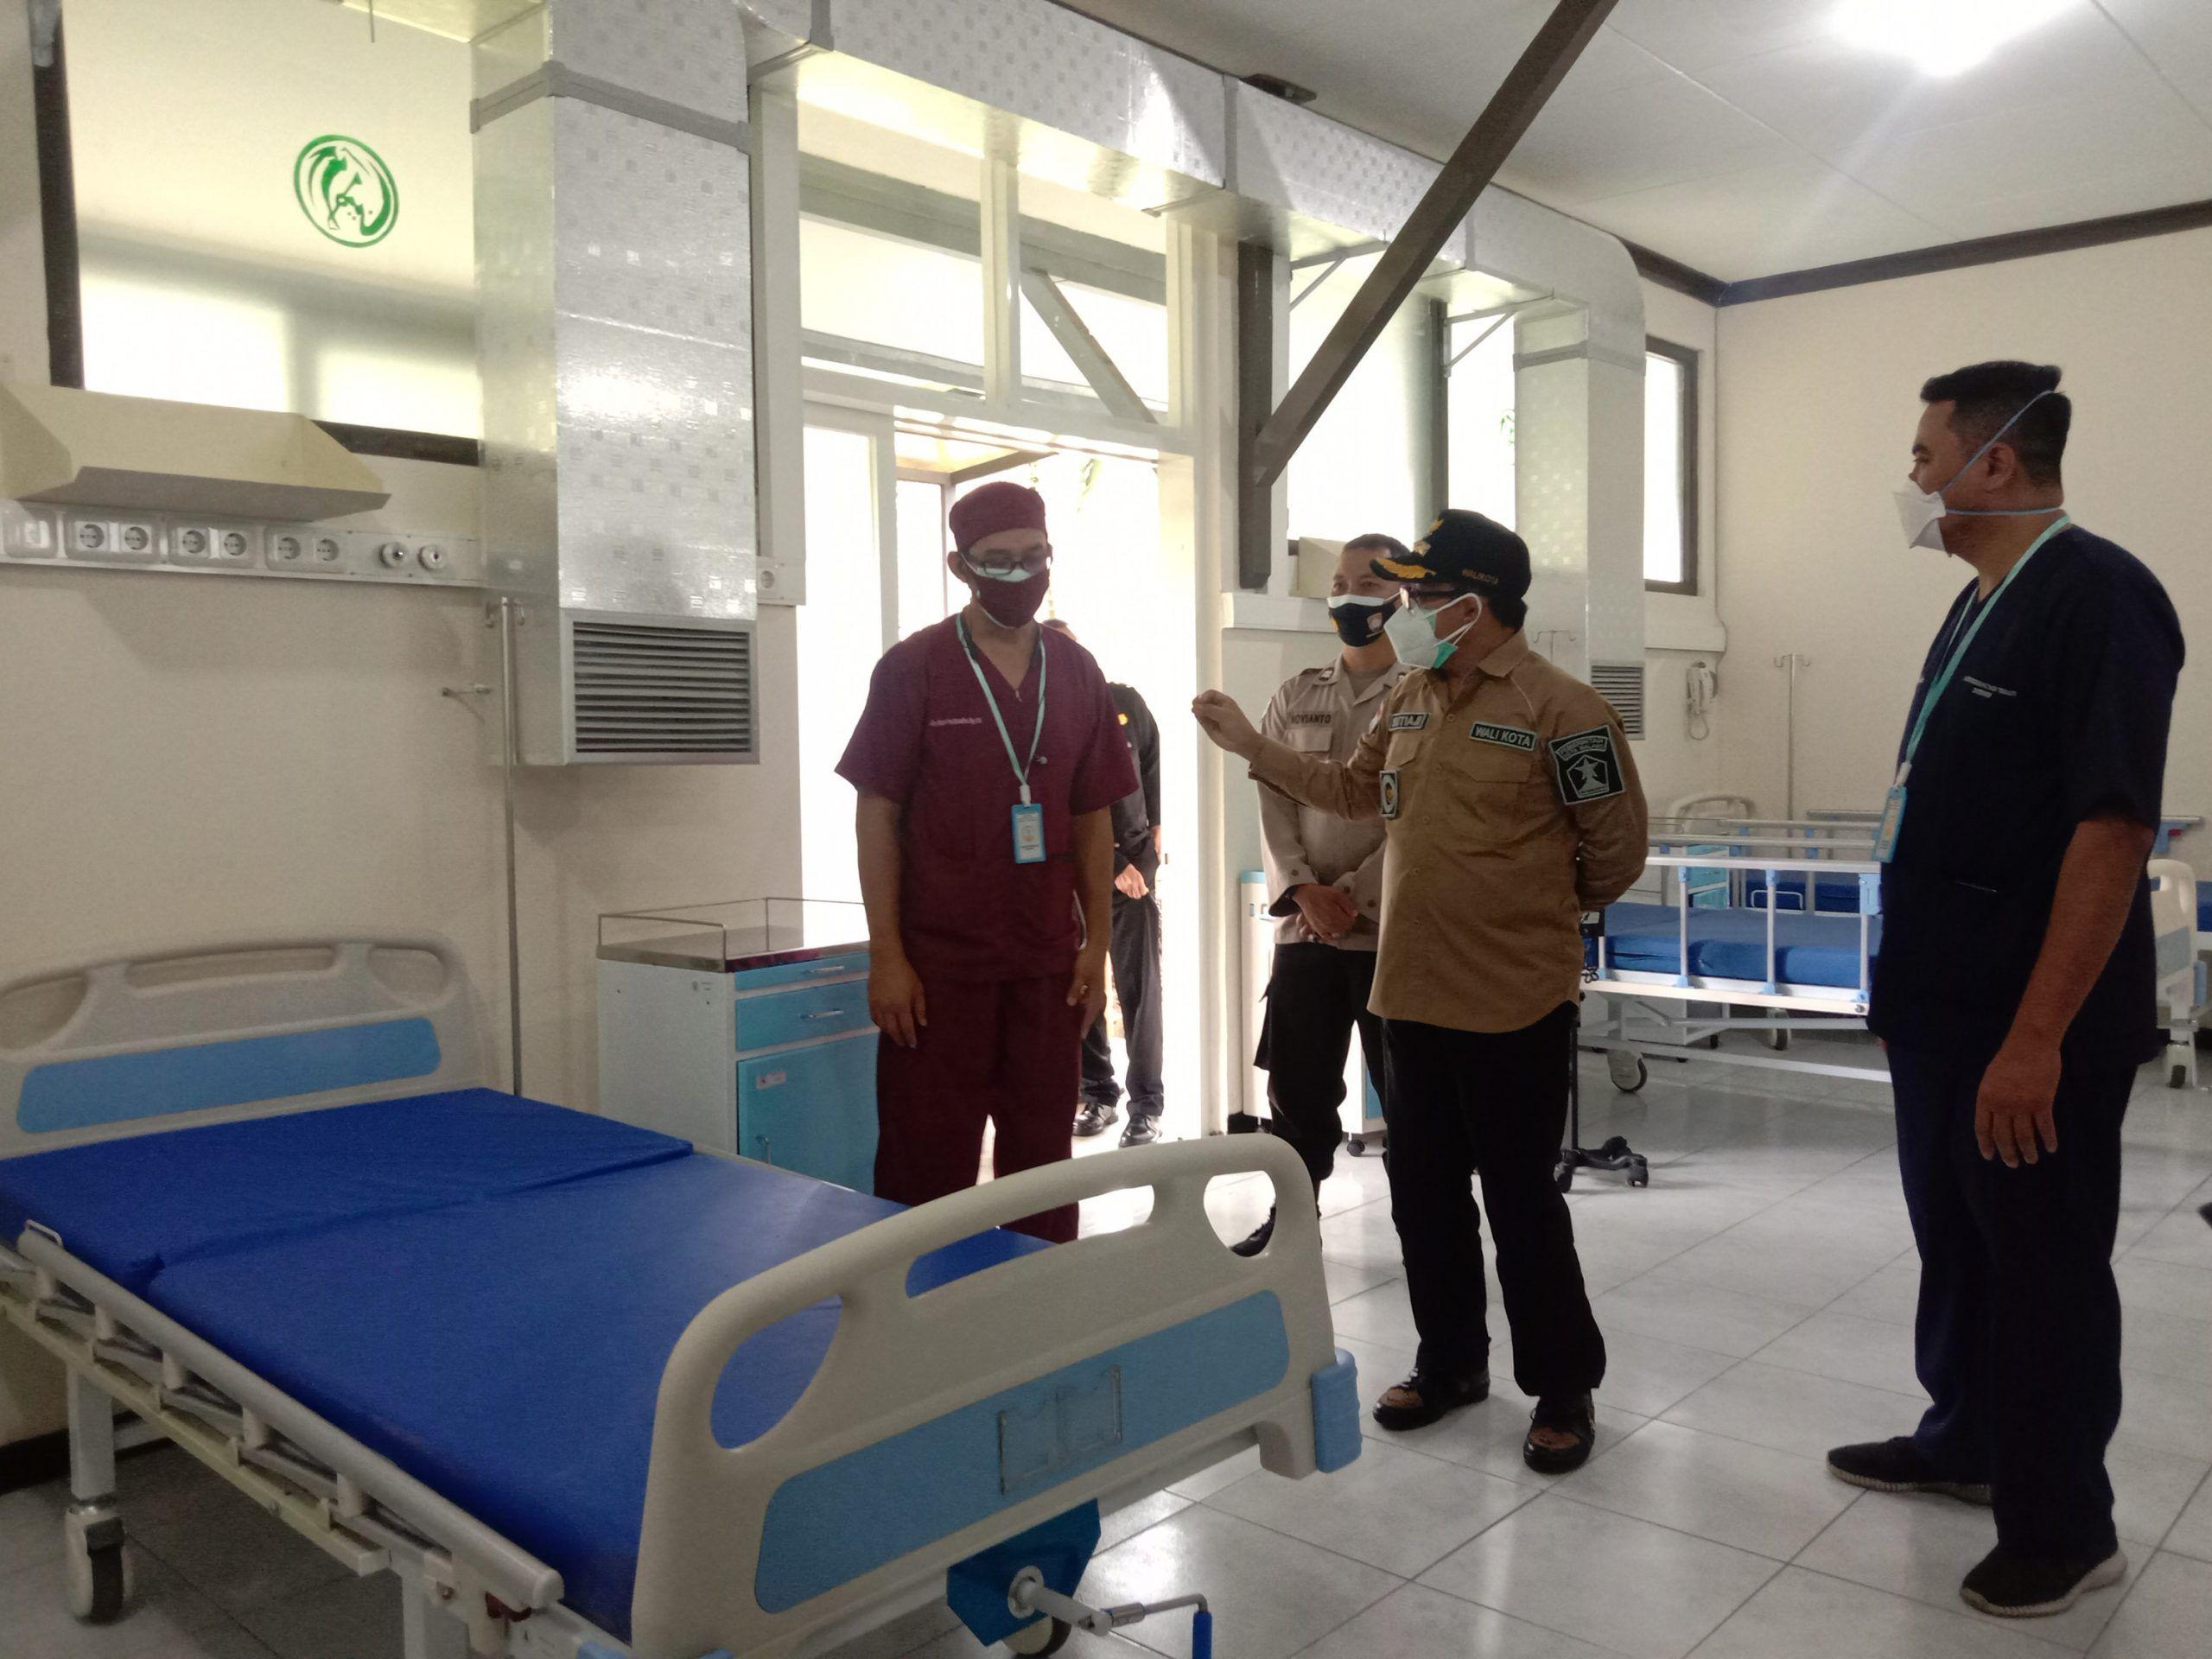 Wali Kota Sutiaji saat meninjau lokasi RS Lapangan Kota Malang. (Foto: Pemkot Malang)